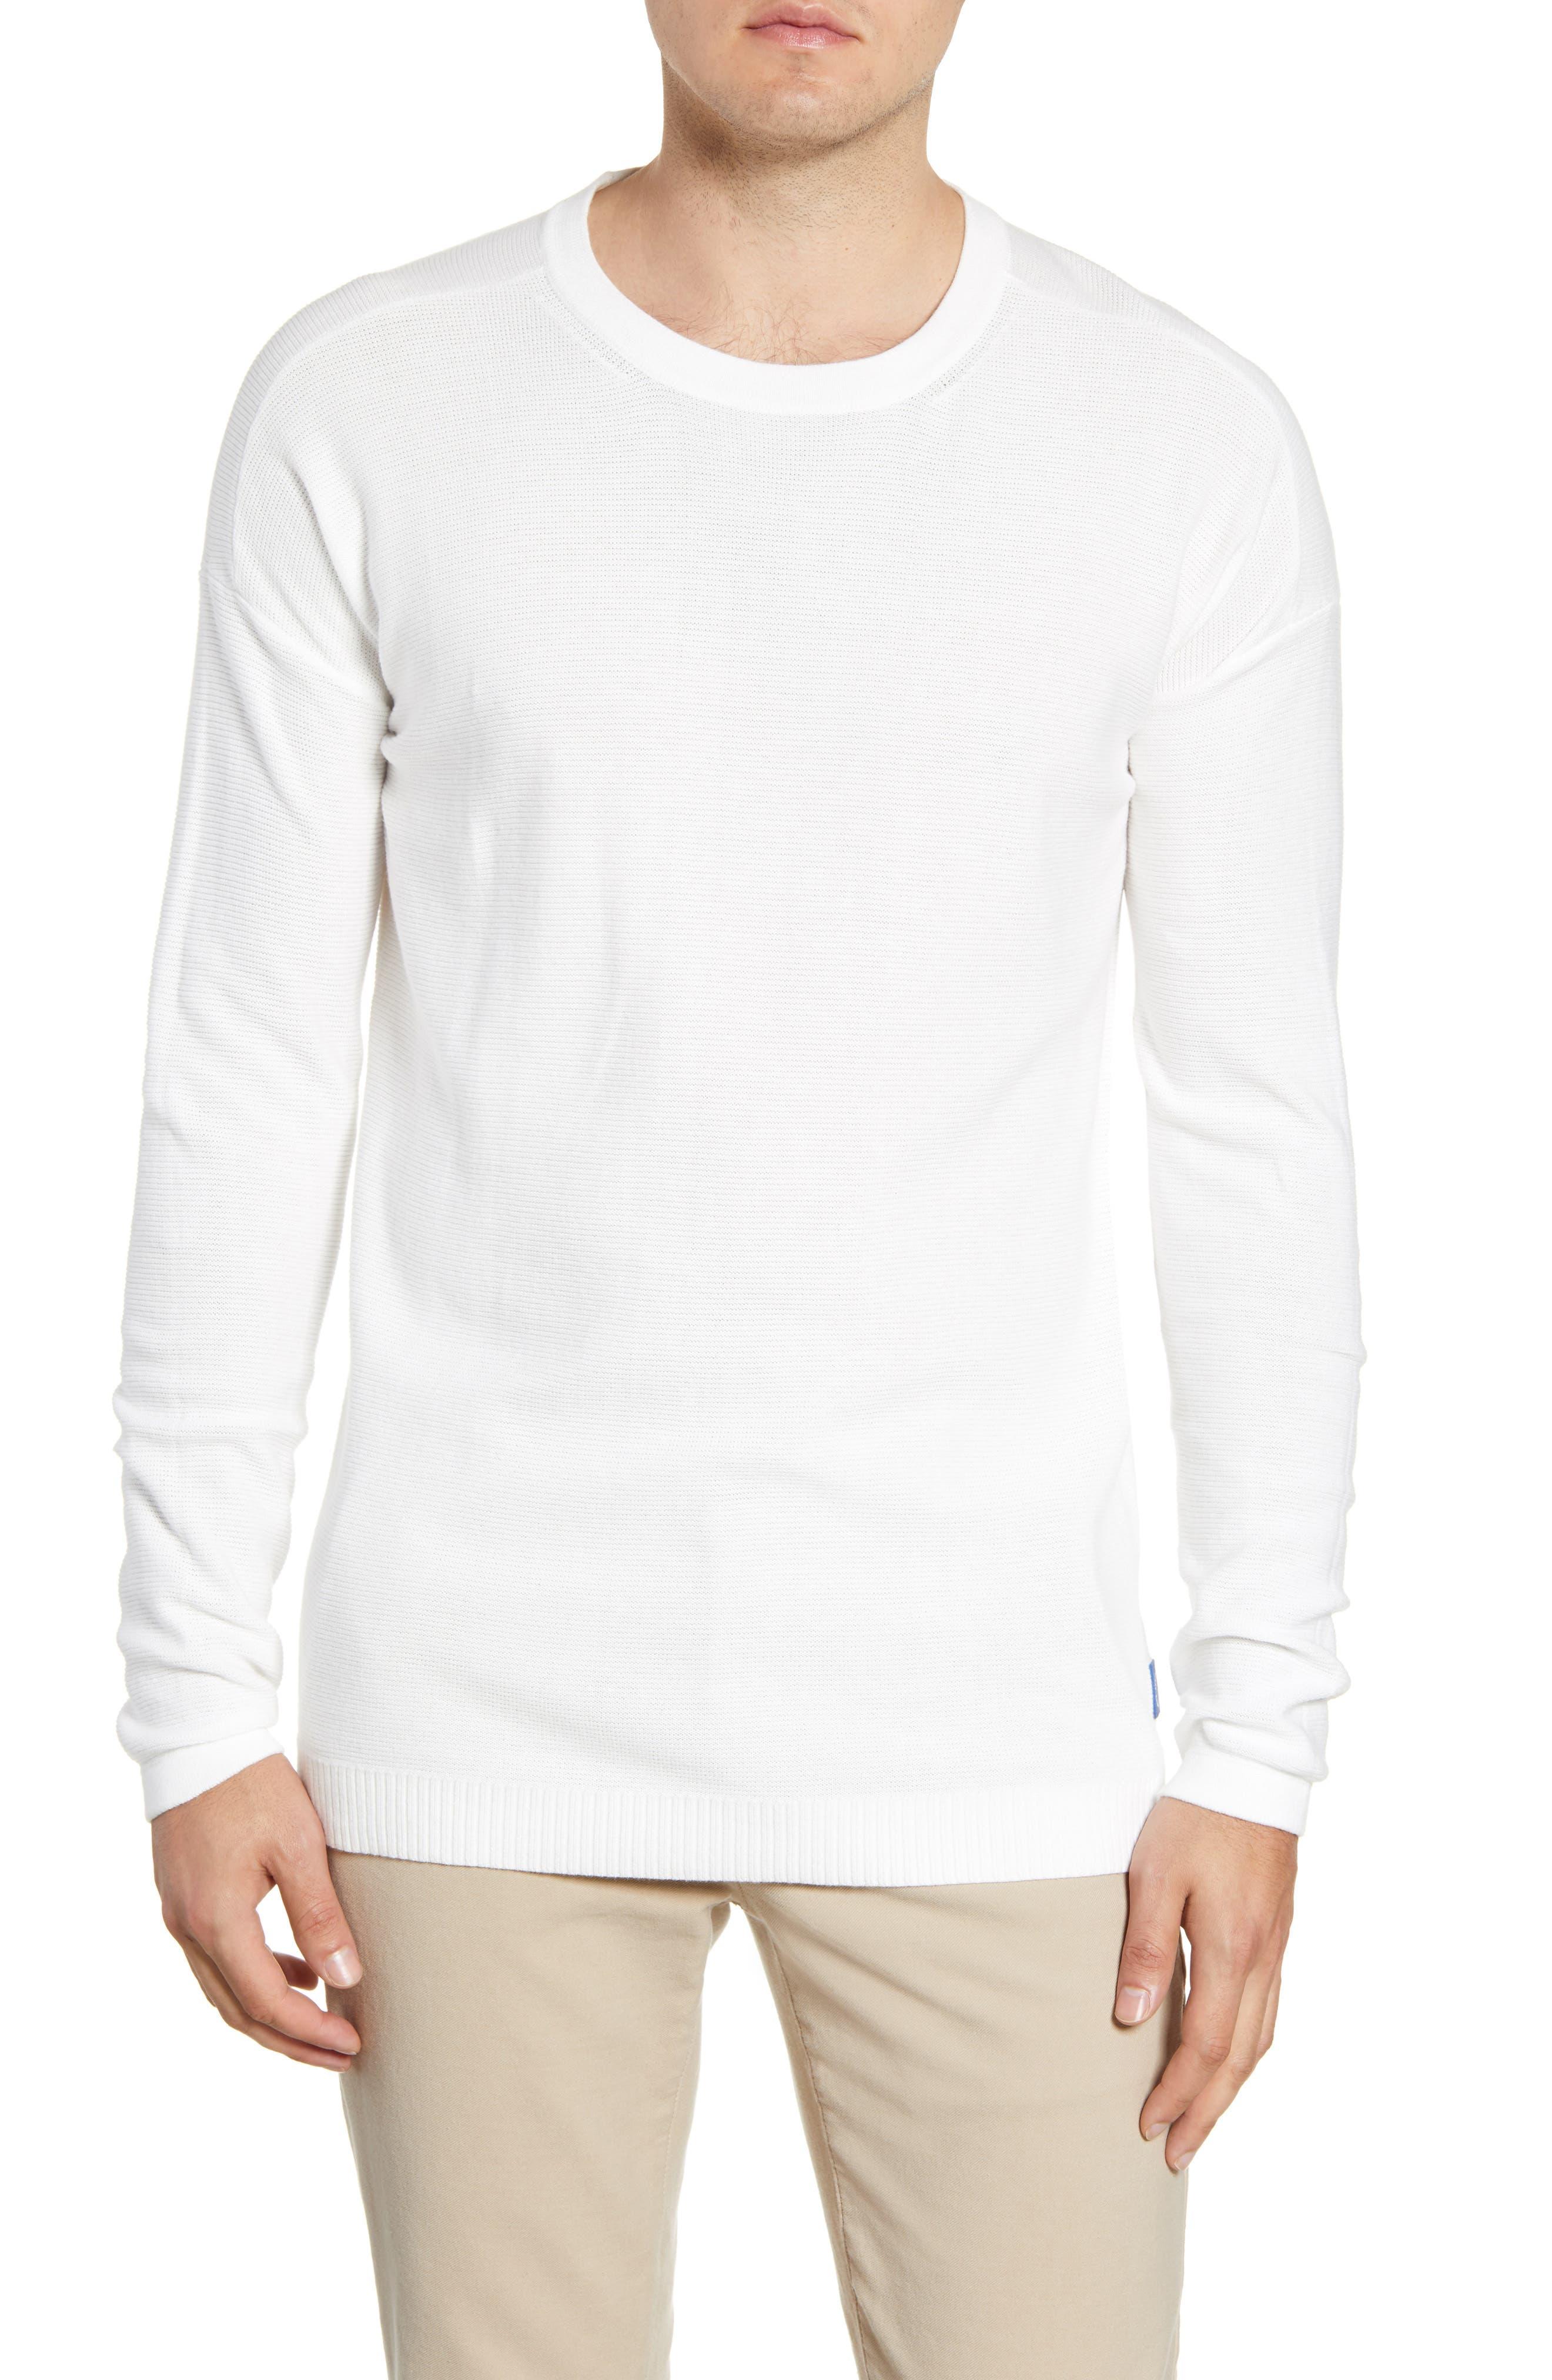 Scotch & Soda Club Nomade Sweater, White